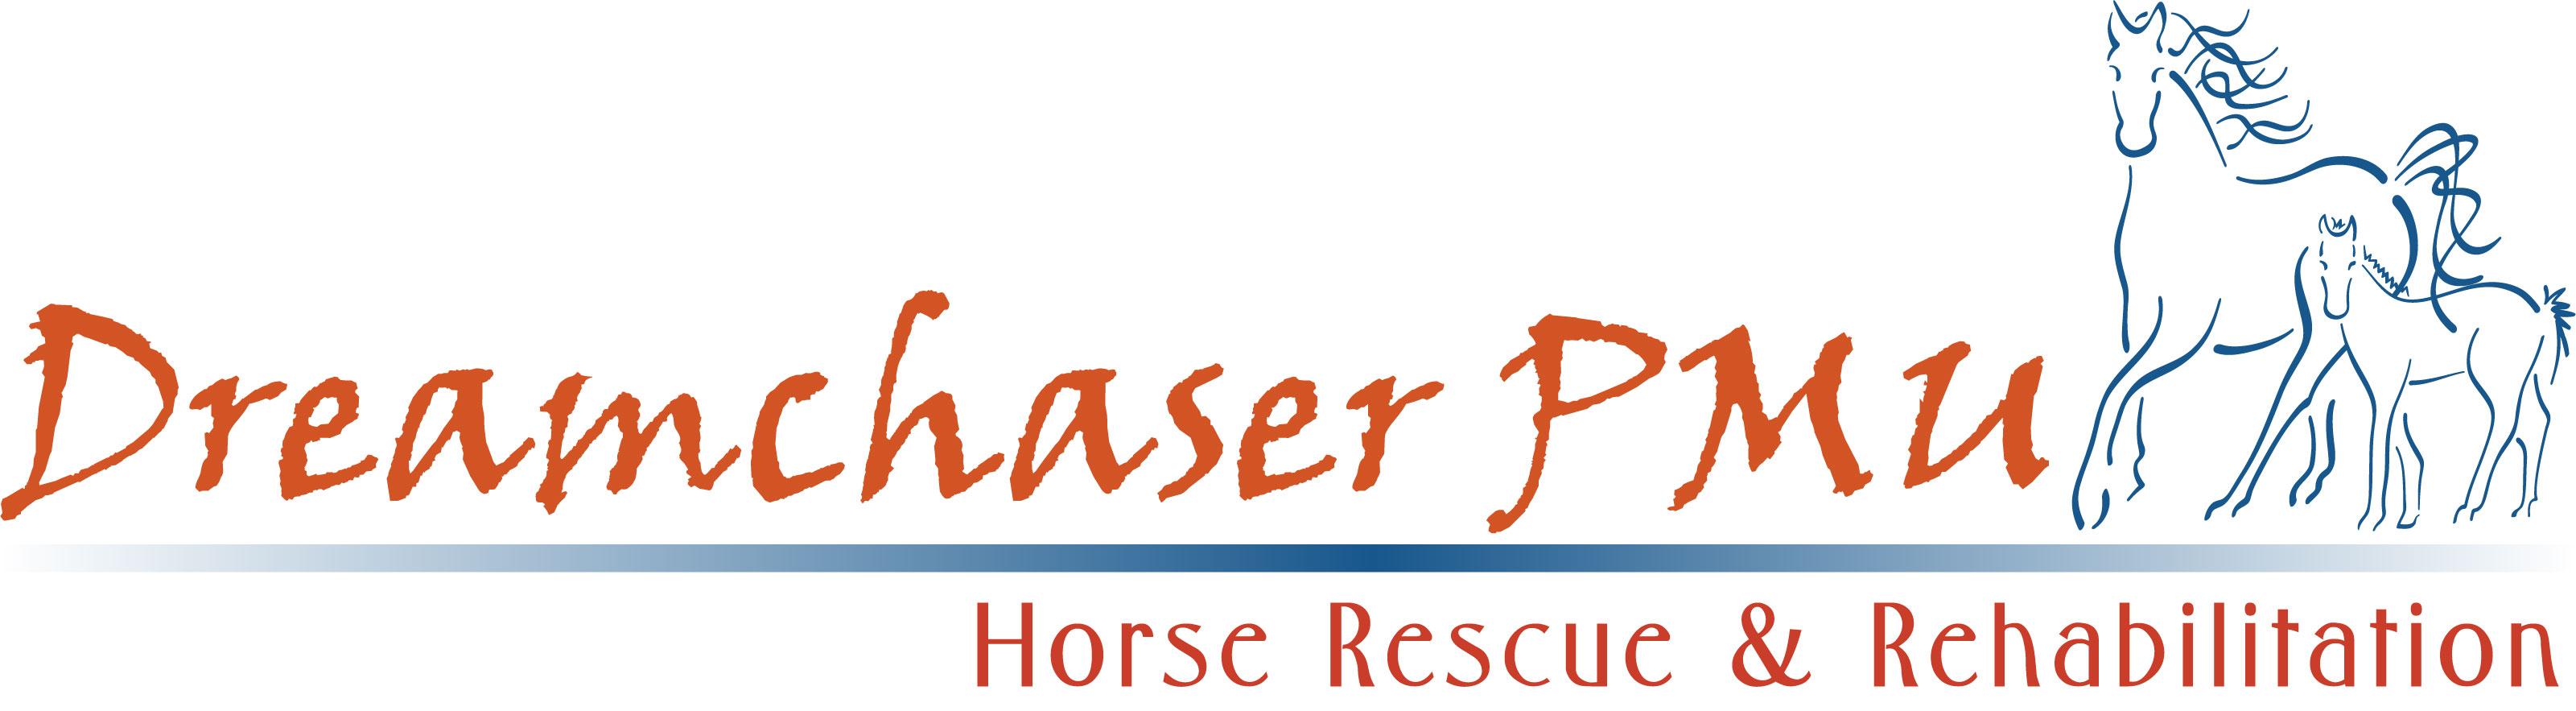 Dreamchaser PMU Rescue & Rehab Inc